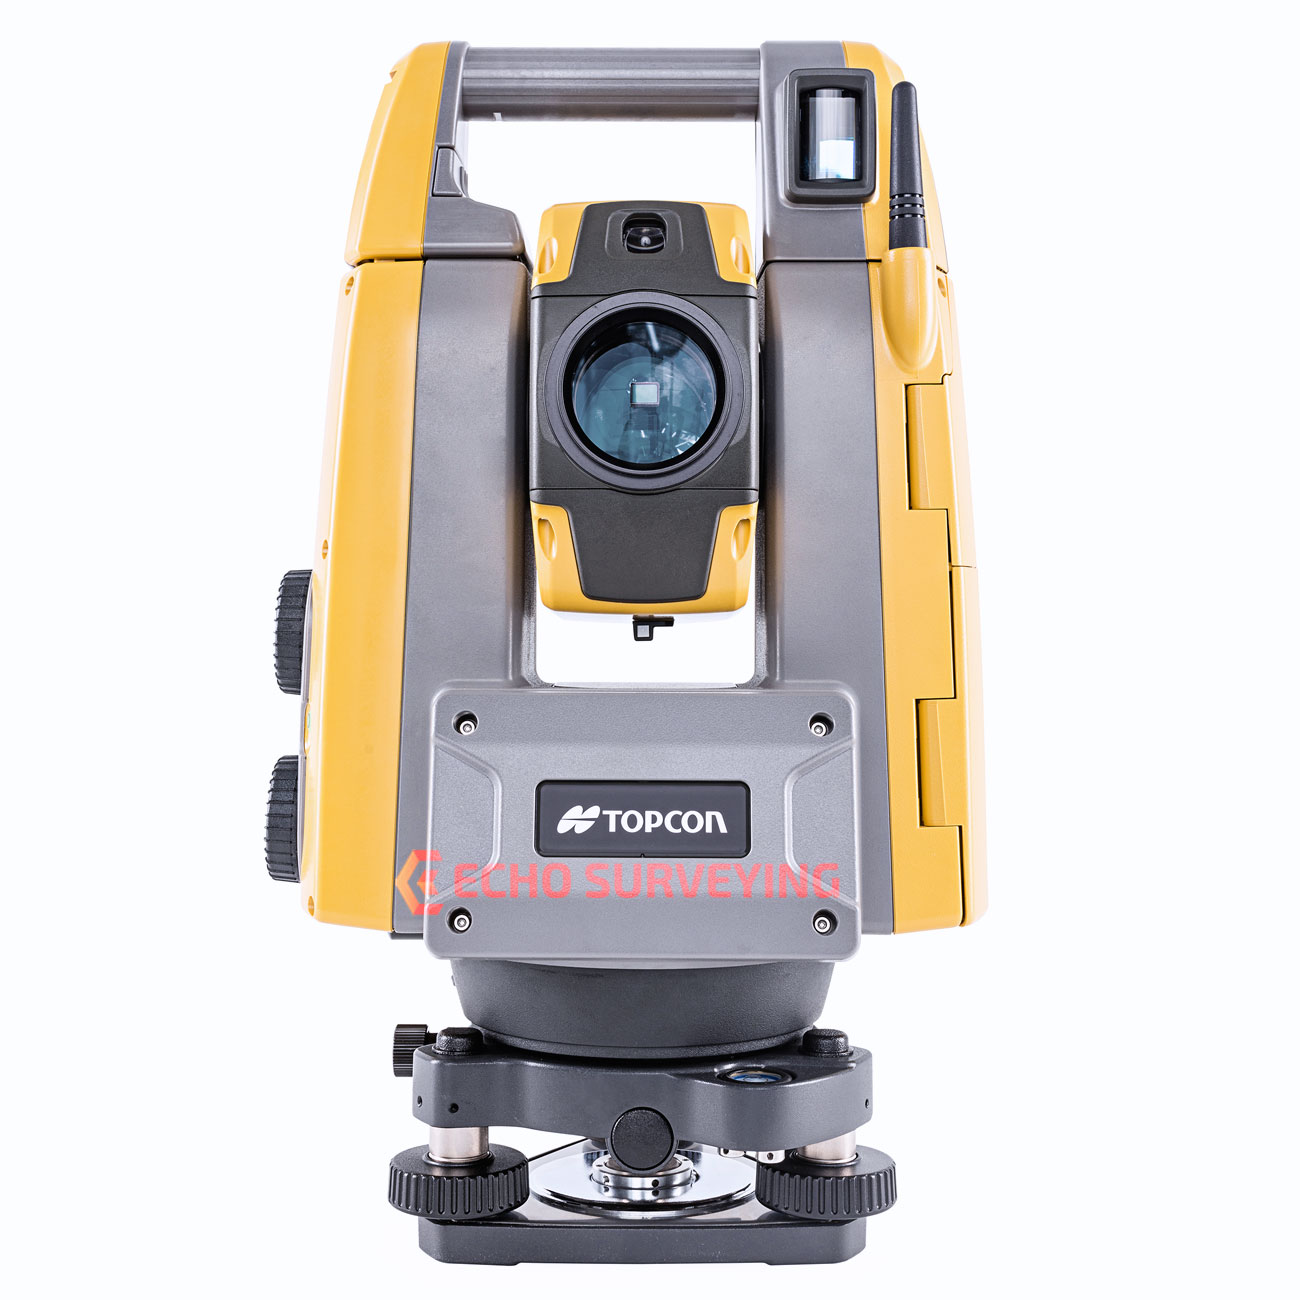 Topcon-GT-503-Robotic-Total-Station.jpg